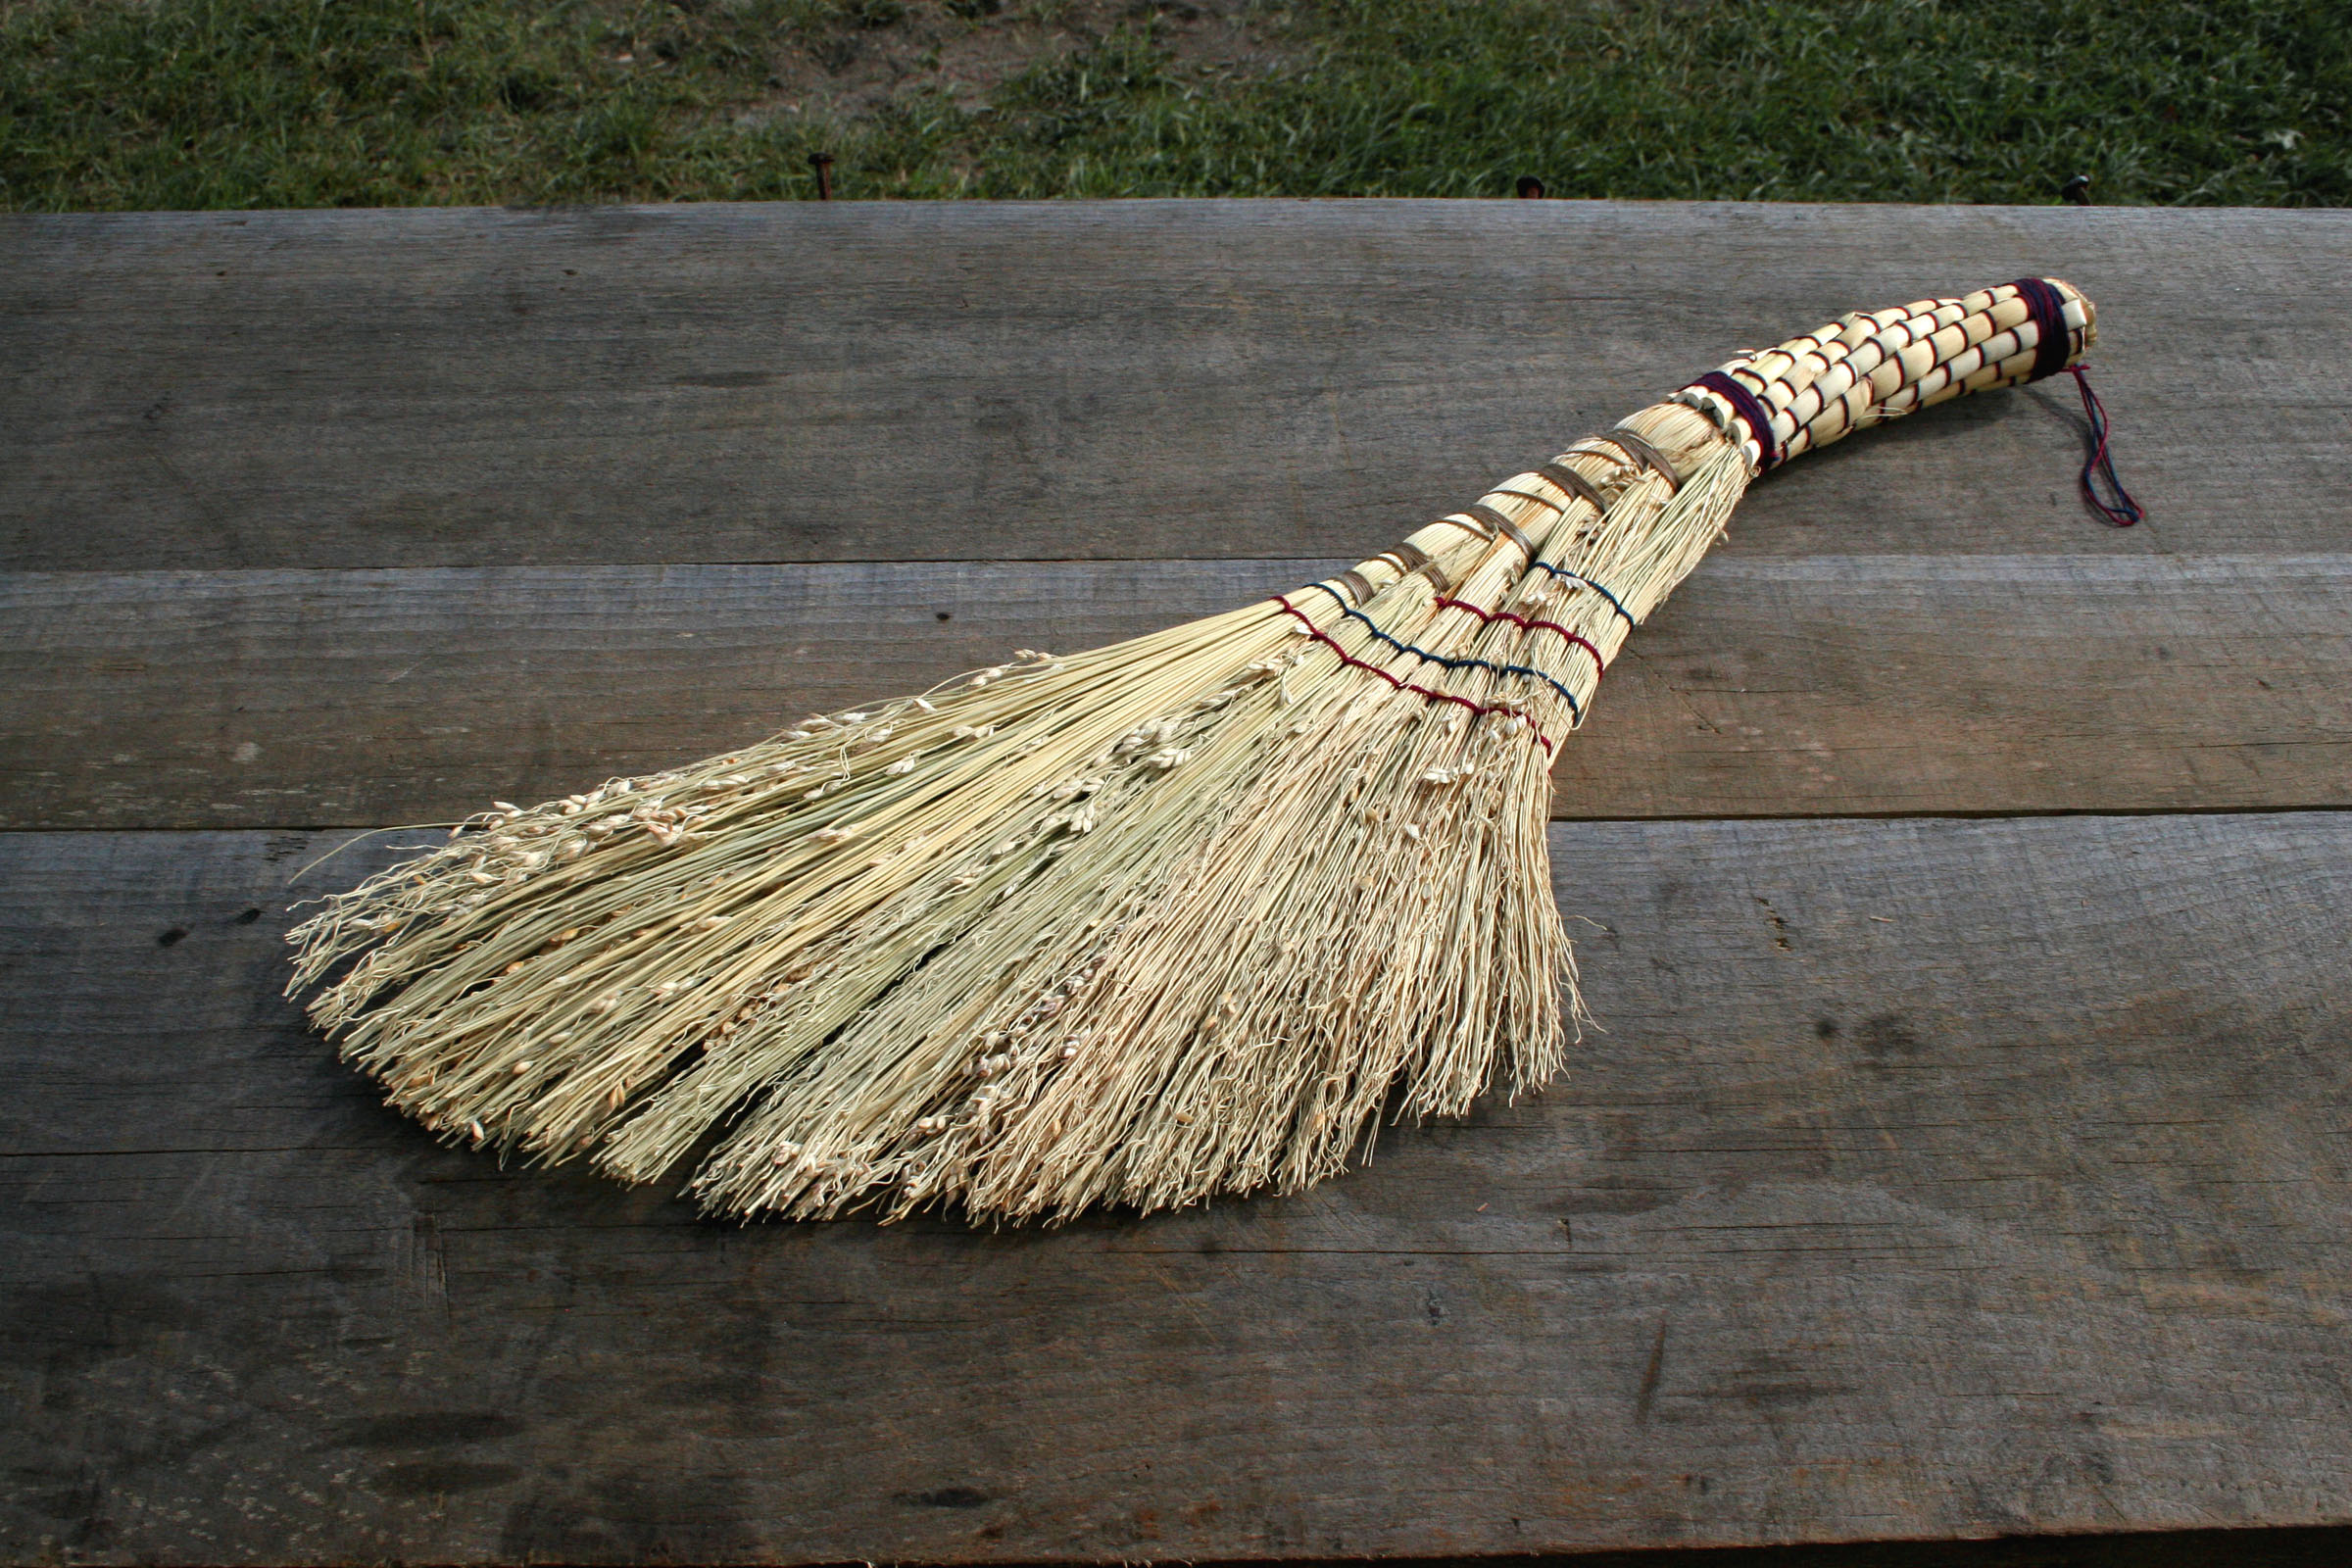 Fantail broom by Saga Erickson of Stark Raven Studios